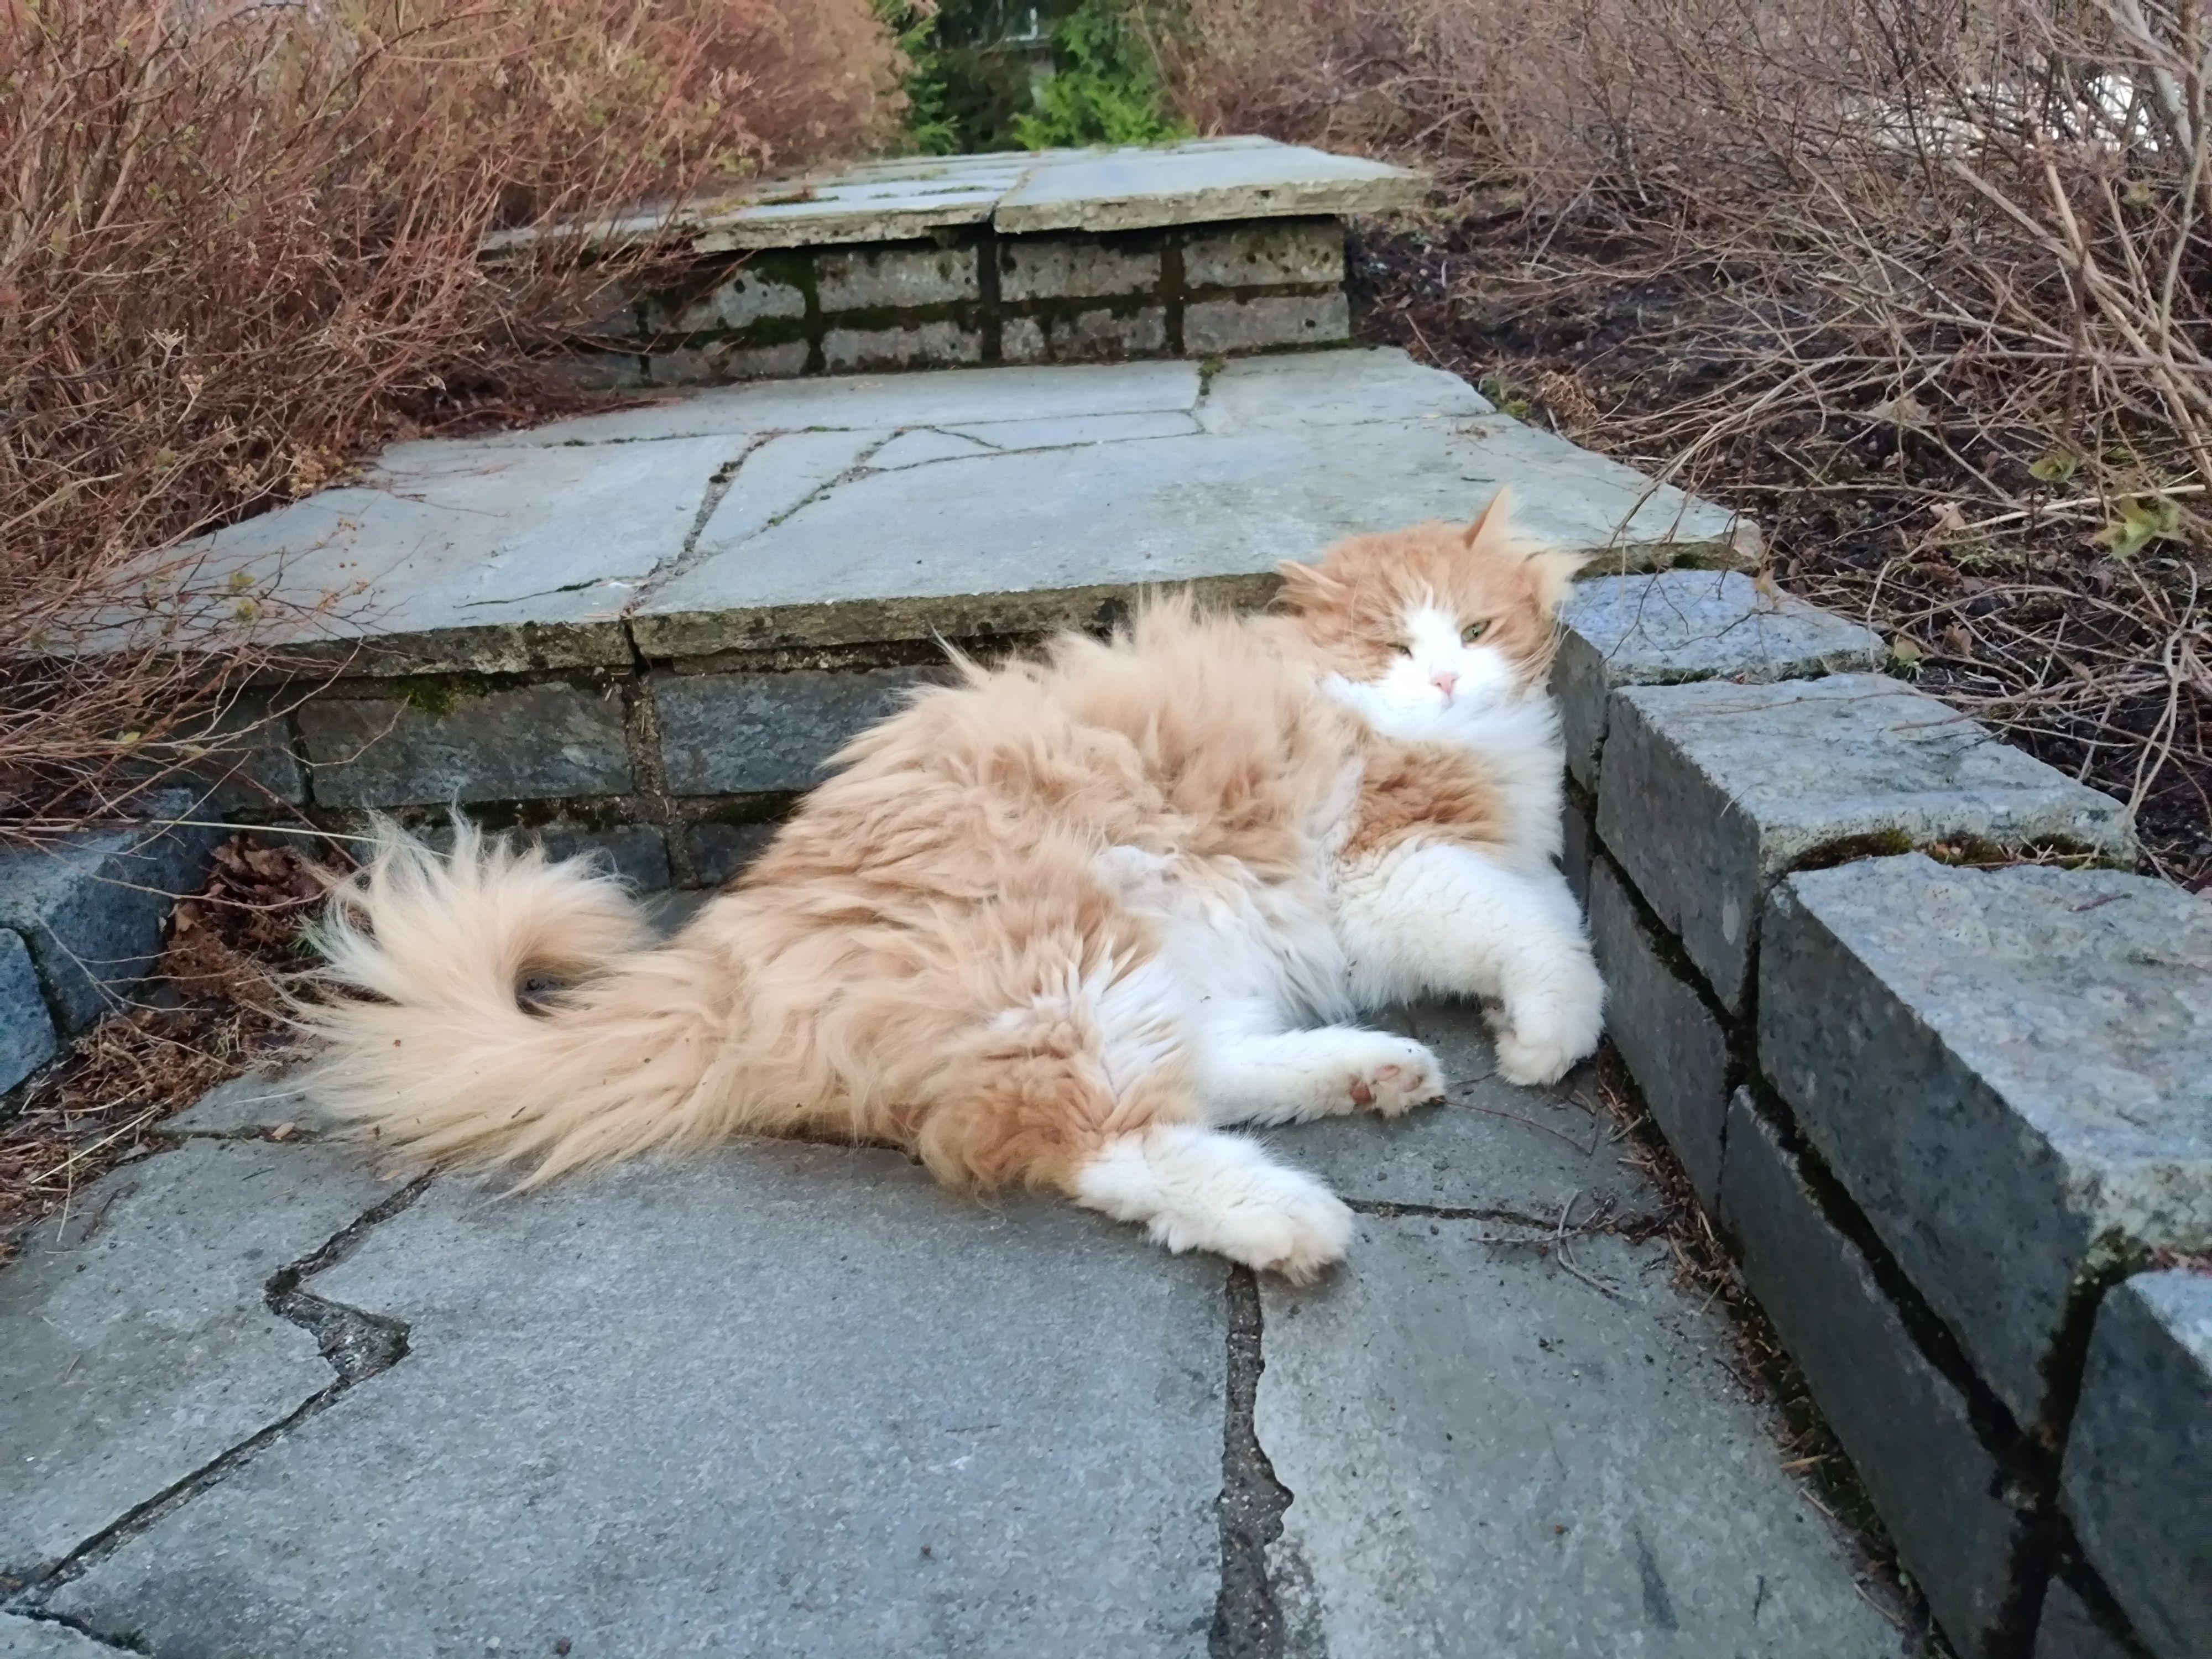 Katta fant den mest behagelige plassen i hagen.